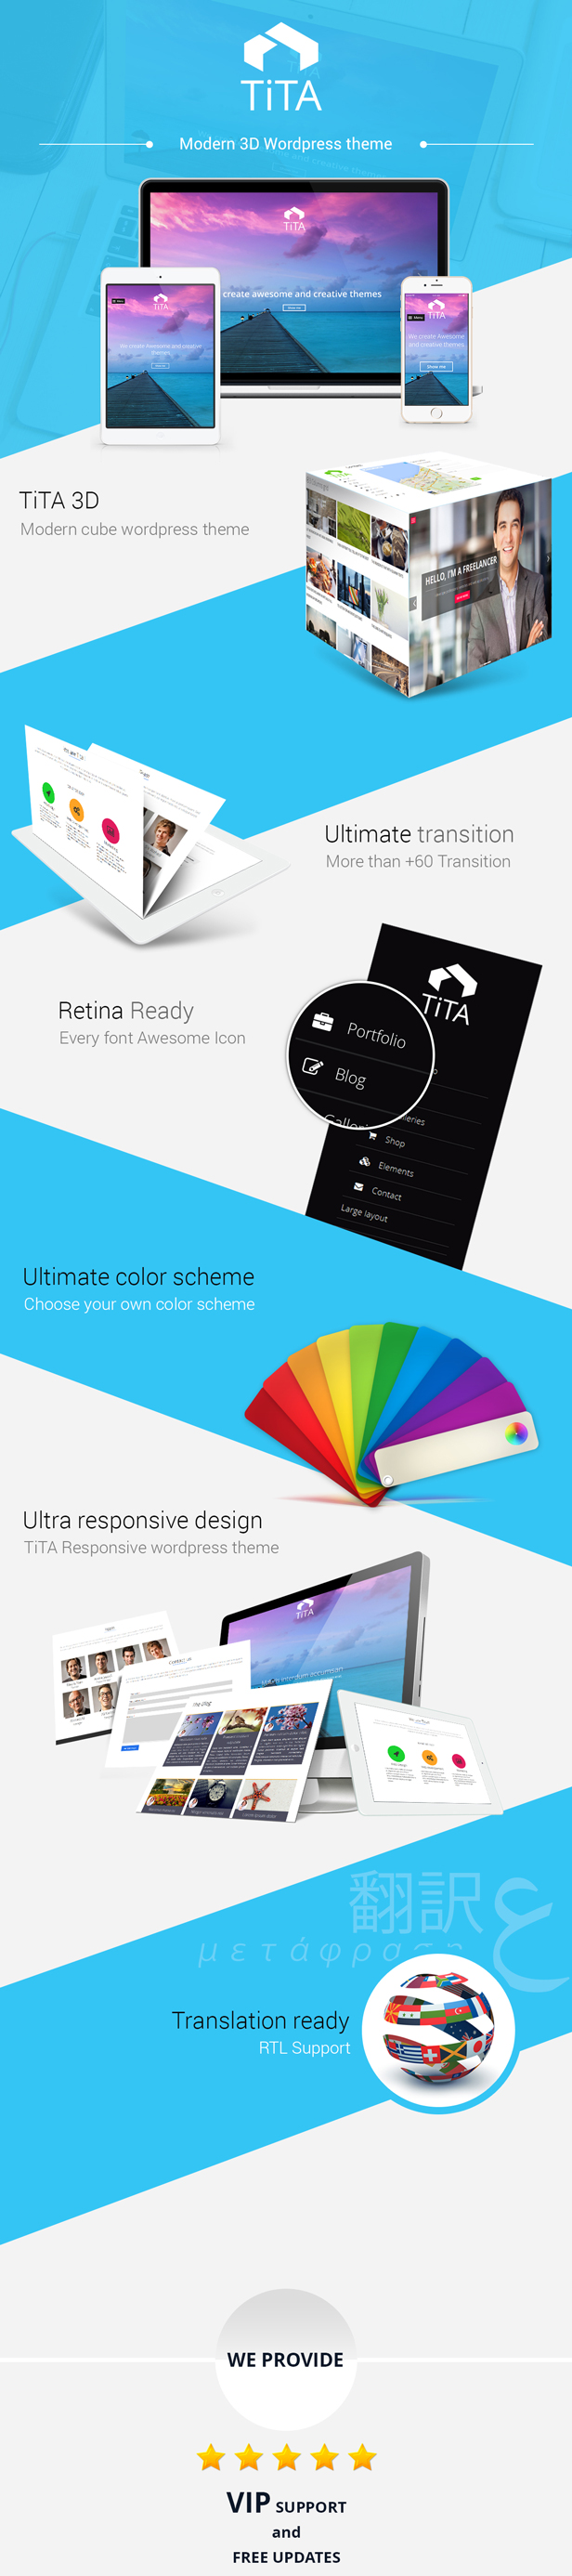 Tita 3D - Modernes WordPress-Template